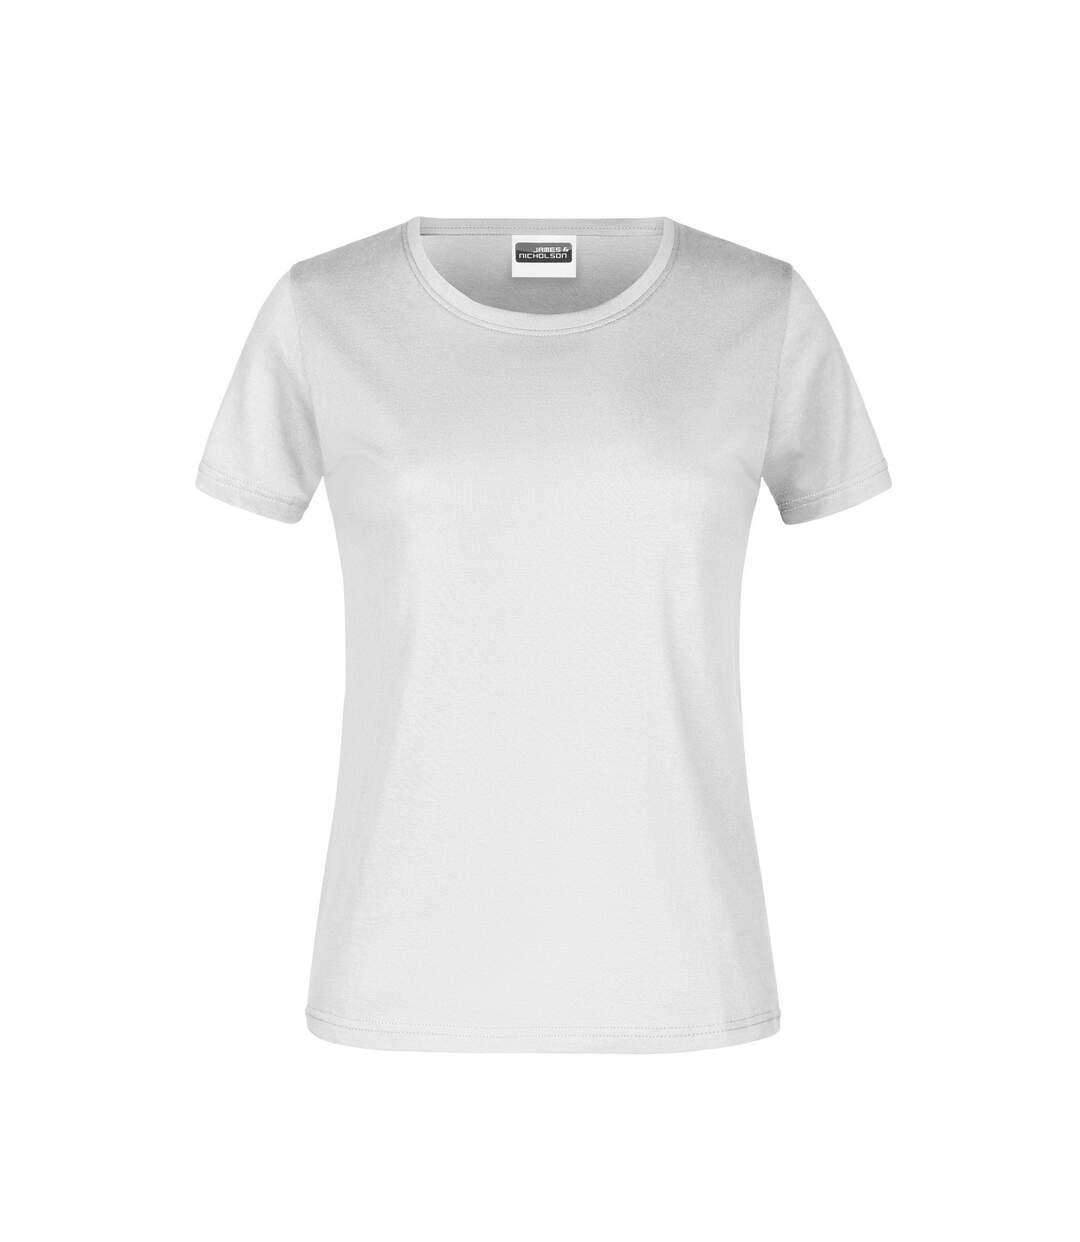 James And Nicholson - T-Shirt Basique - Femme (Blanc) - UTFU957